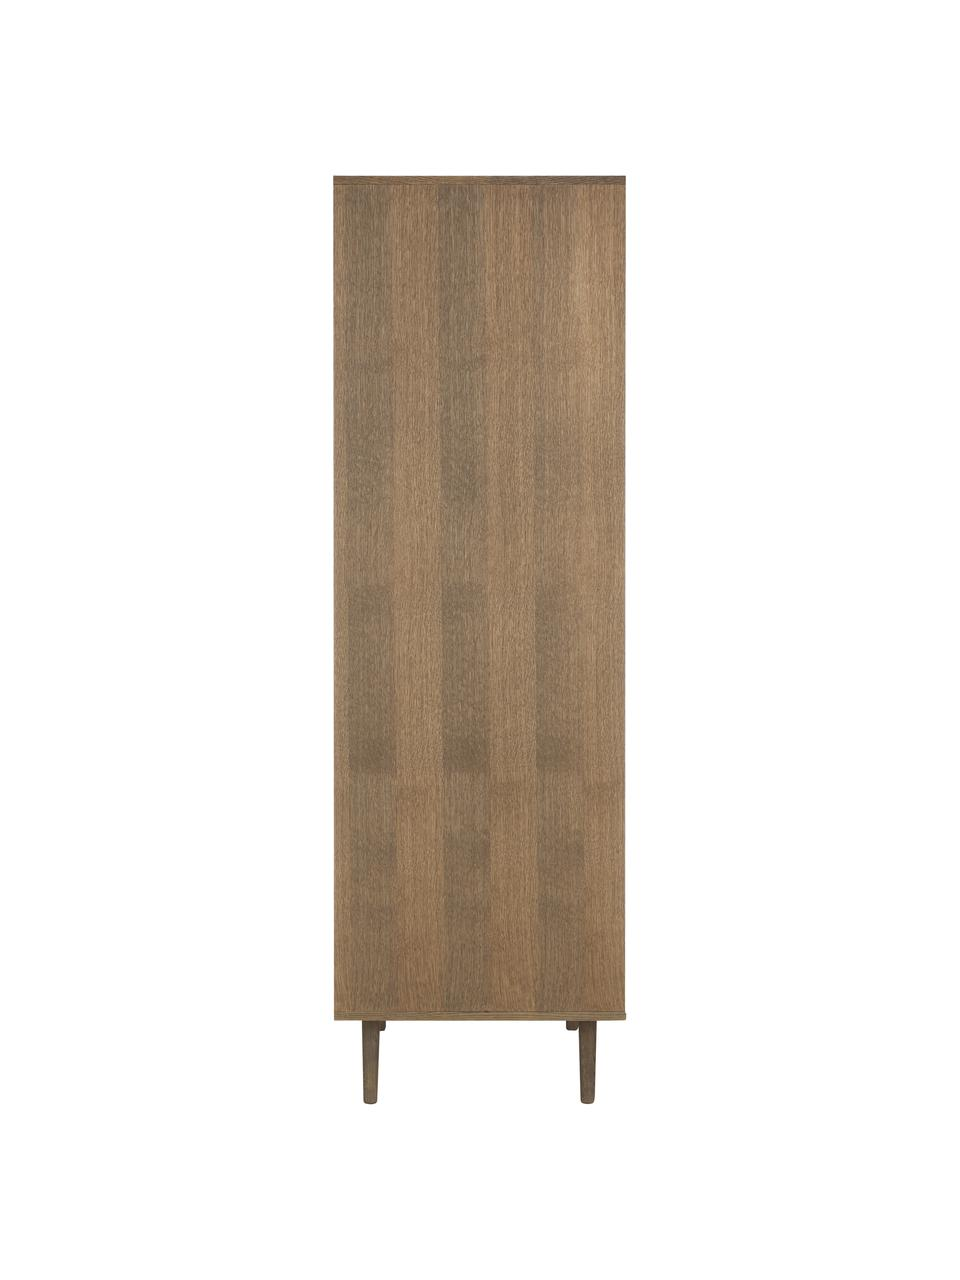 Kledingkast Aries in donkerbruin, Frame: spaanplaat met eikenhoutf, Poten: massief eikenhout, Donker hout, 100 x 194 cm